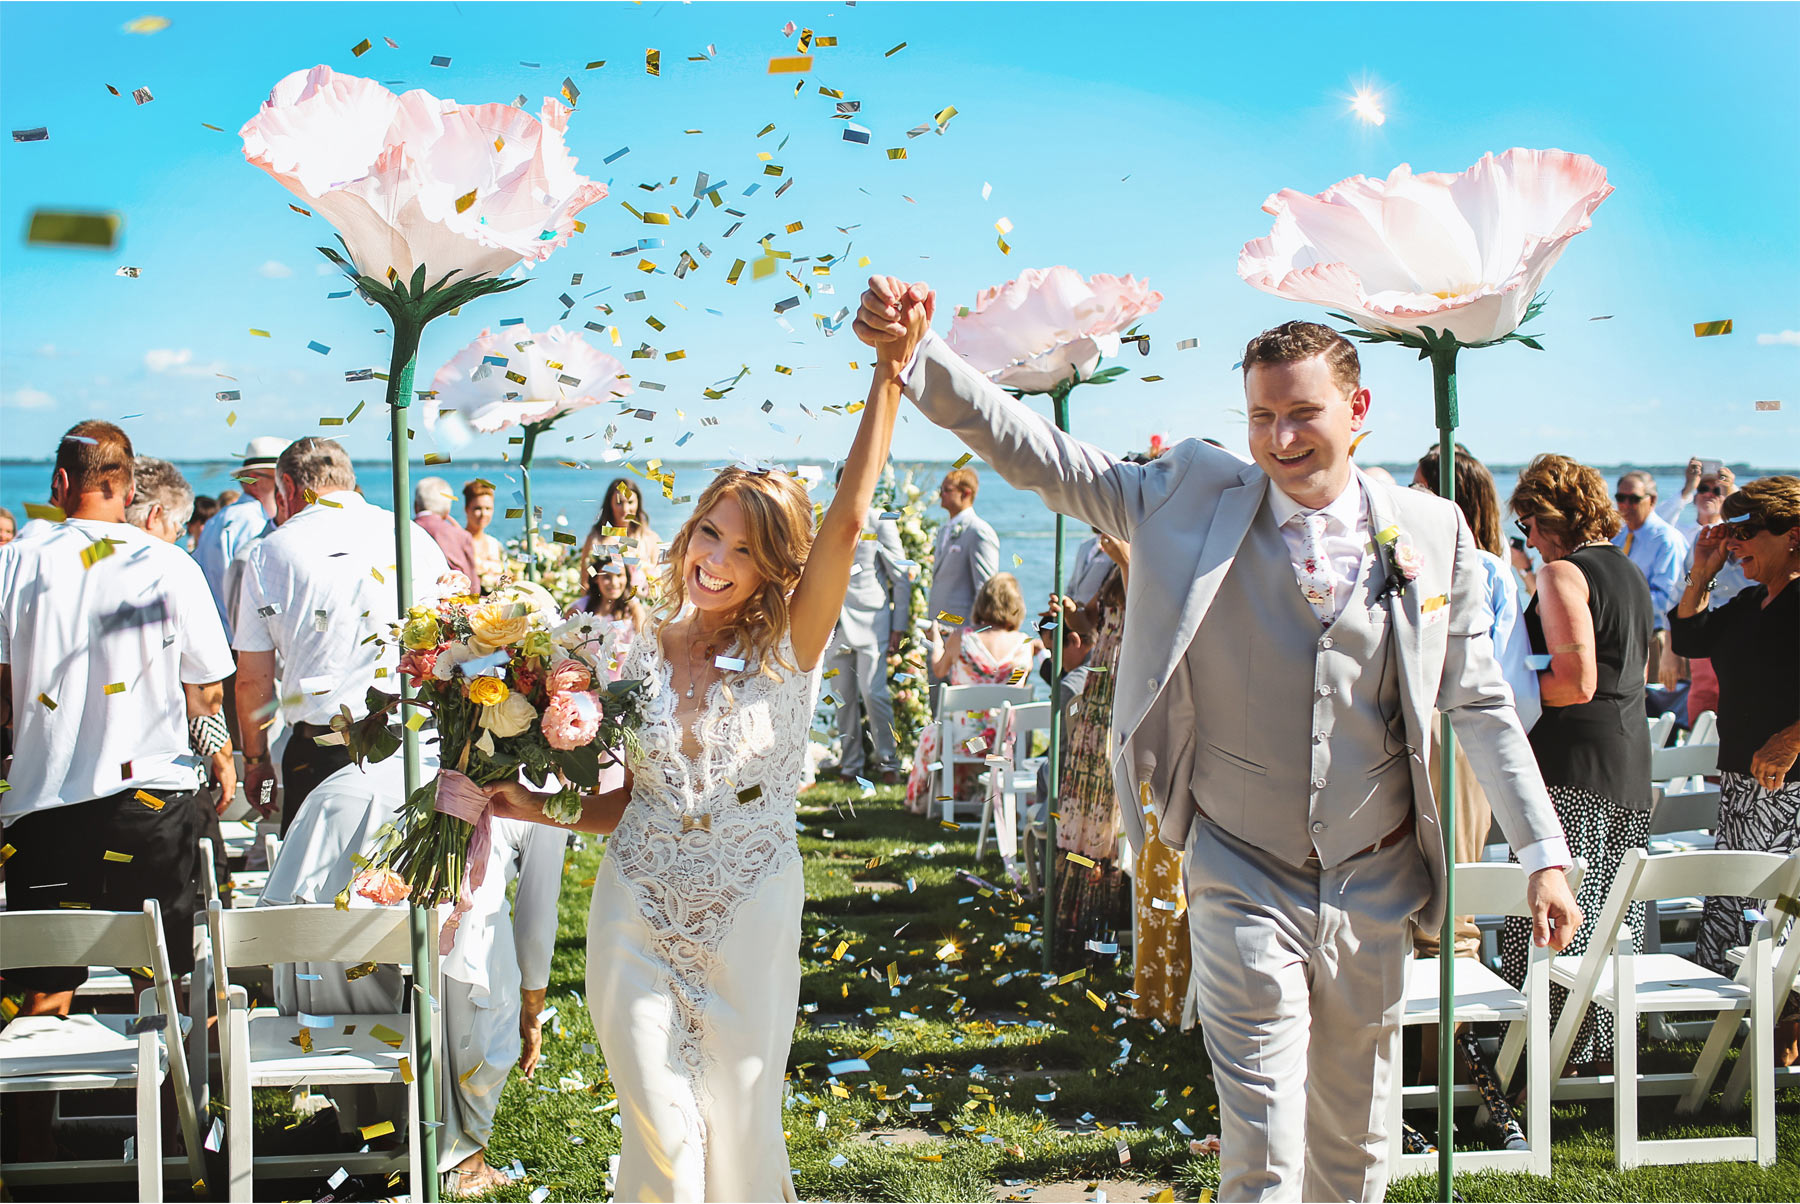 16-Vick-Photography-Wedding-Ottertail-Minnesota-Alice-in-Wonderland-Theme-Ceremony-Outdoor-Lake-Bride-Groom-Giant-Poppys-Flowers-Confetti-Tess-and-Greg.jpg